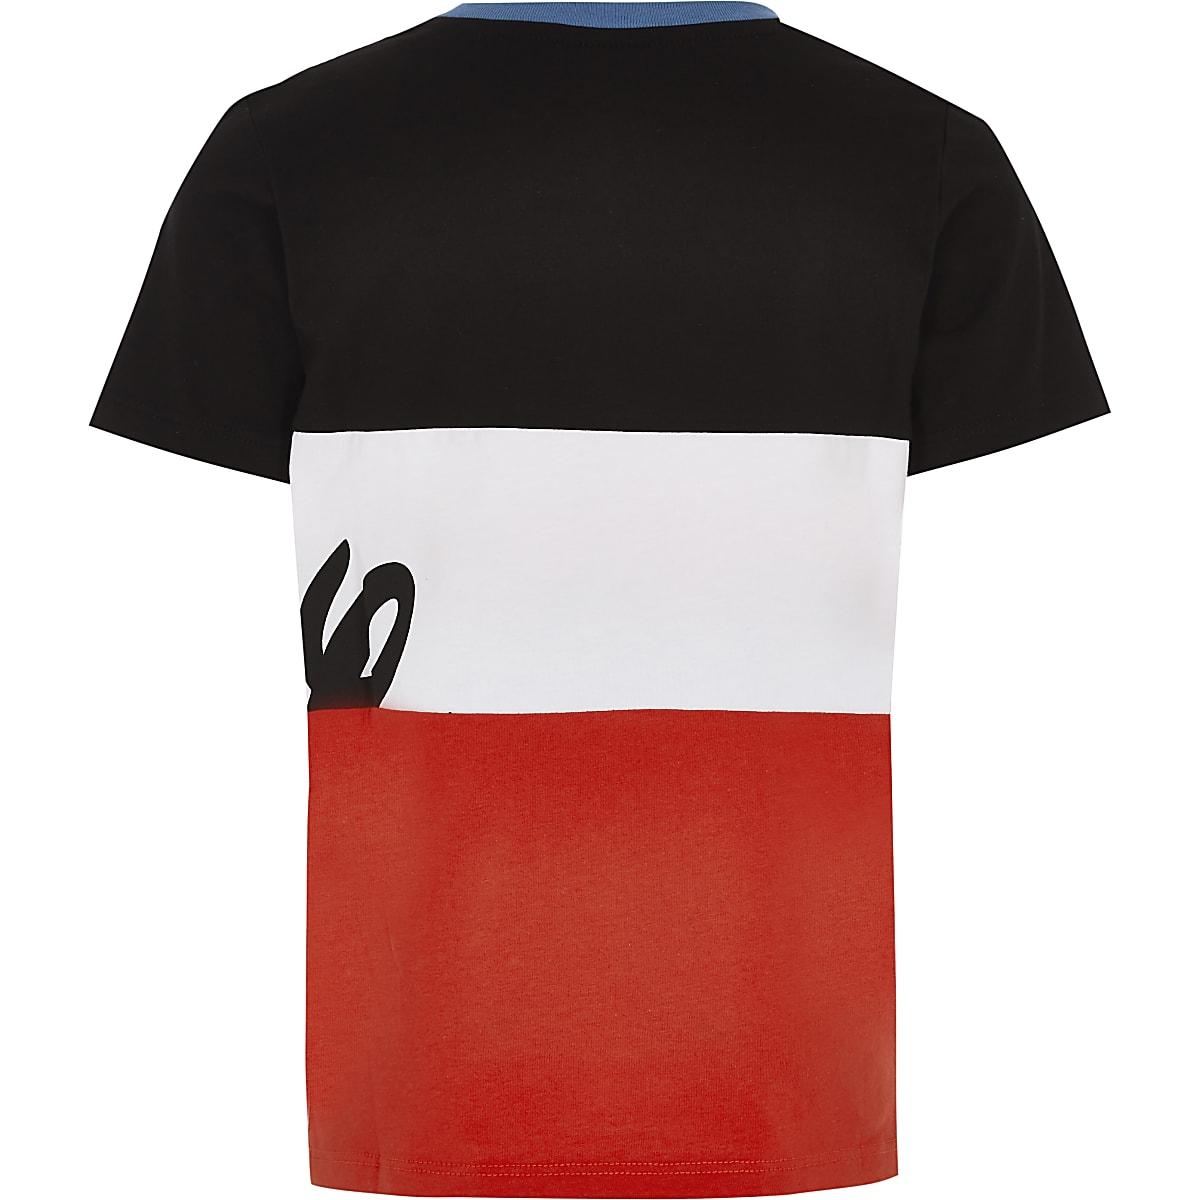 66a08df06 Boys Disney x Hype black colour block T-shirt - T-shirts - T-Shirts ...